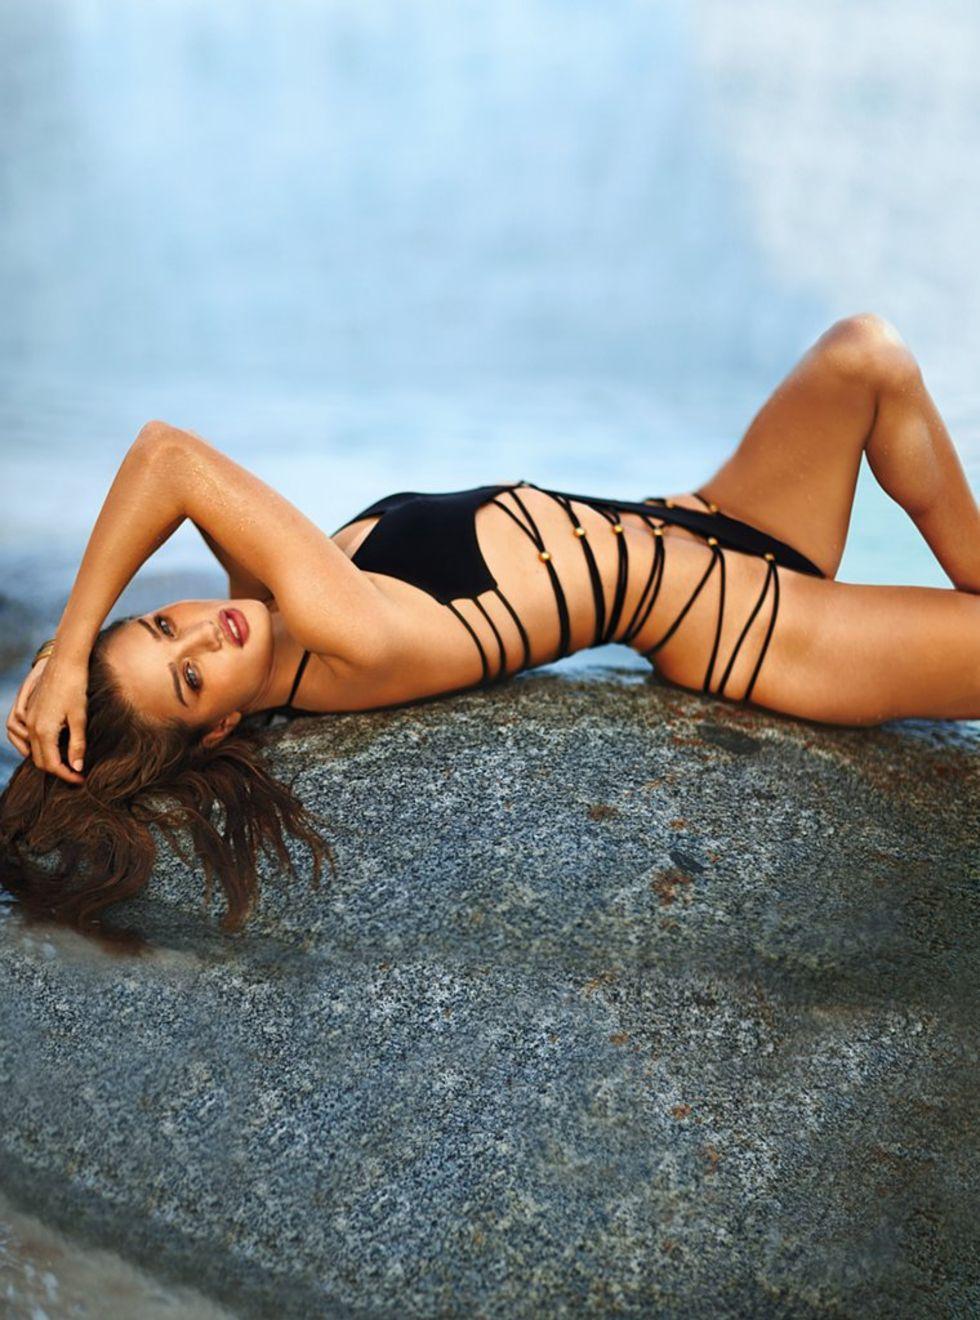 rosie-huntington-whiteley-victorias-secret-bikini-photoshoot-mq-01